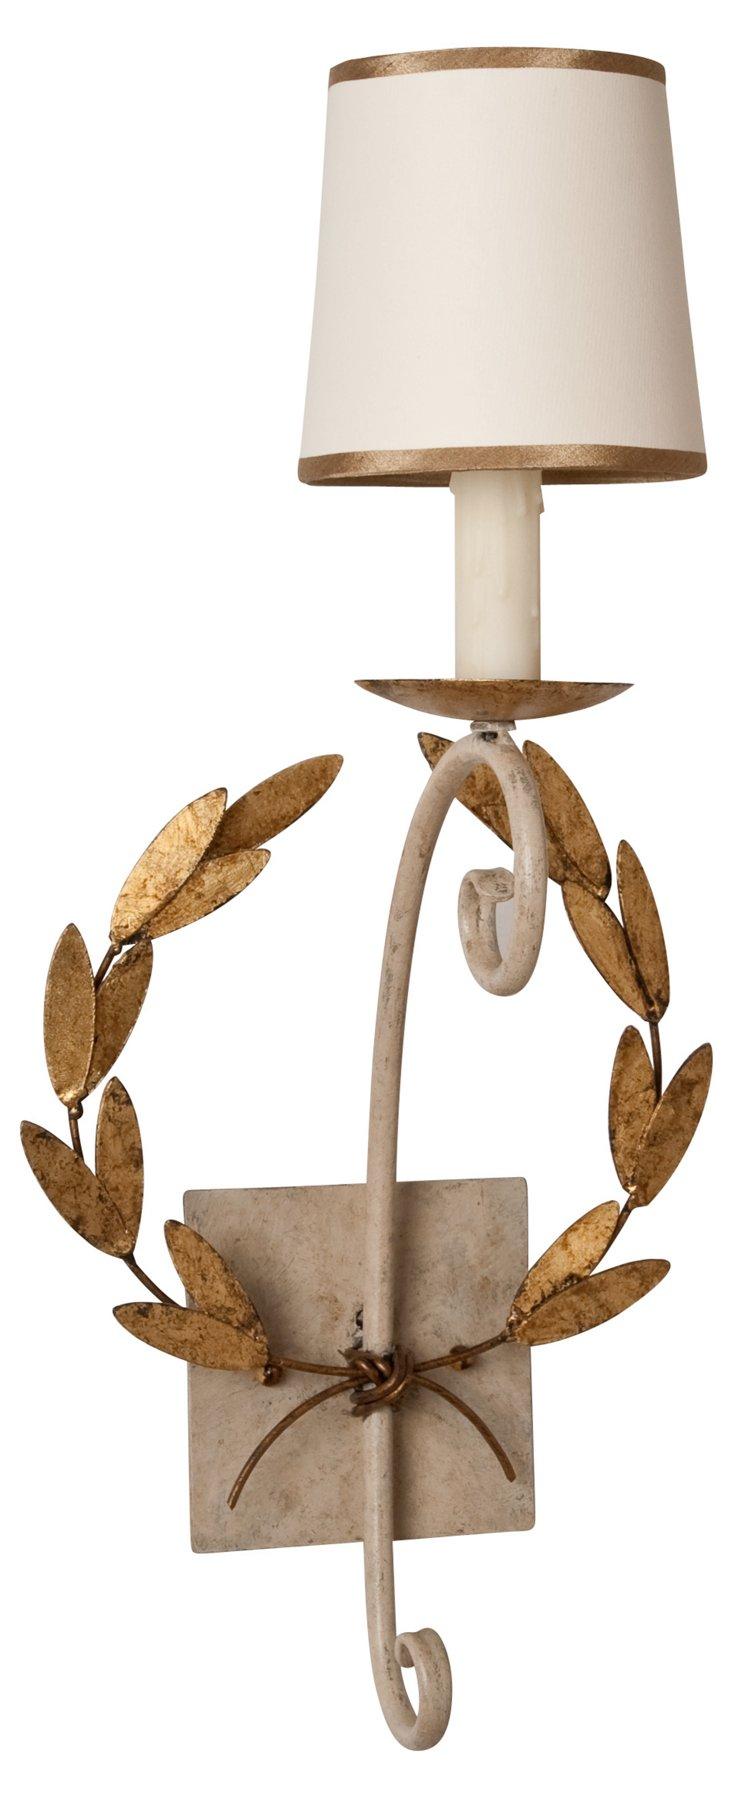 Wreath Sconce